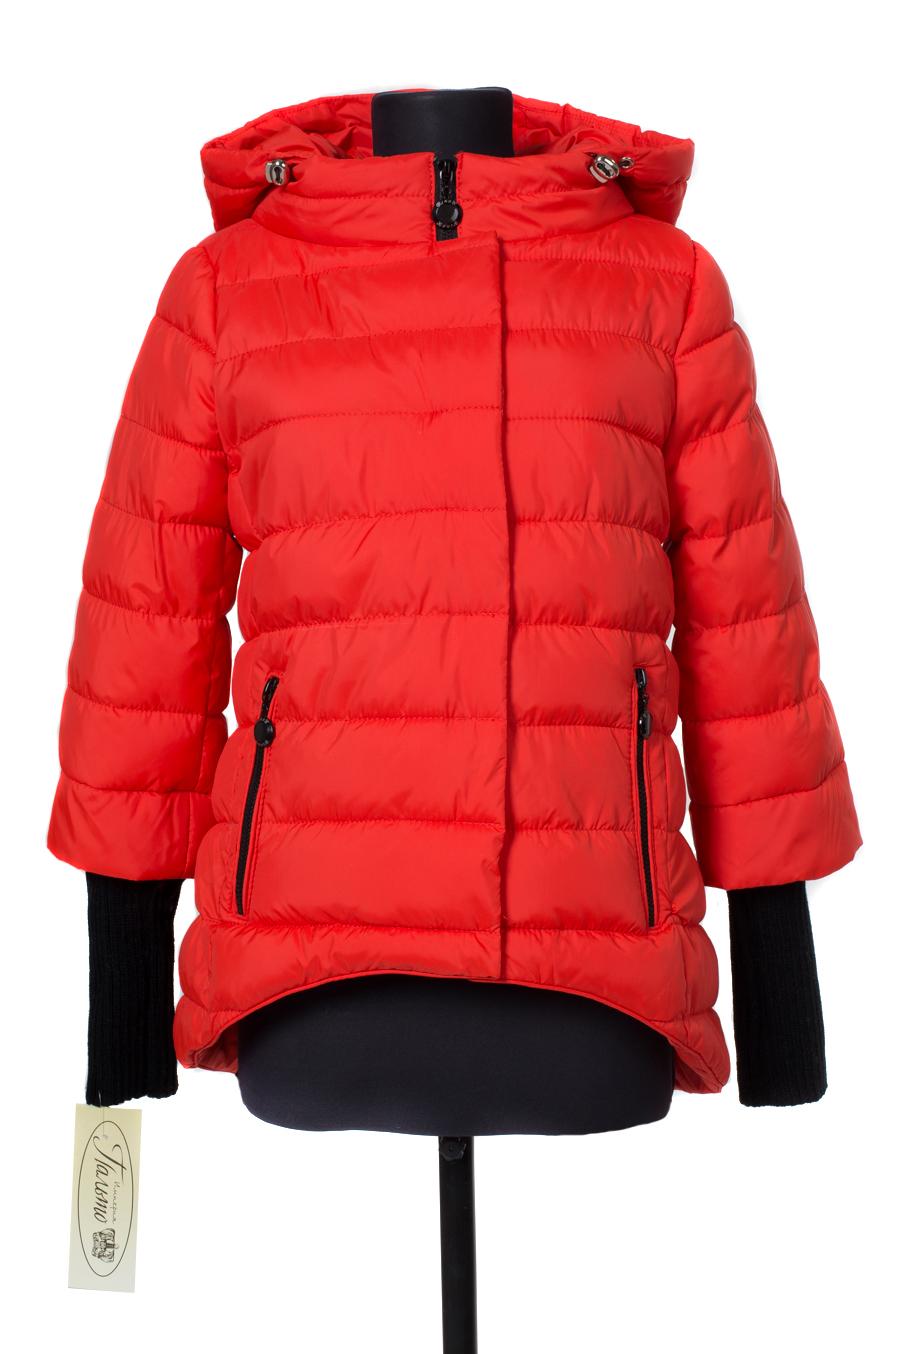 04-0651 Куртка демисезонная (Синтепух 150) Плащевка Алый